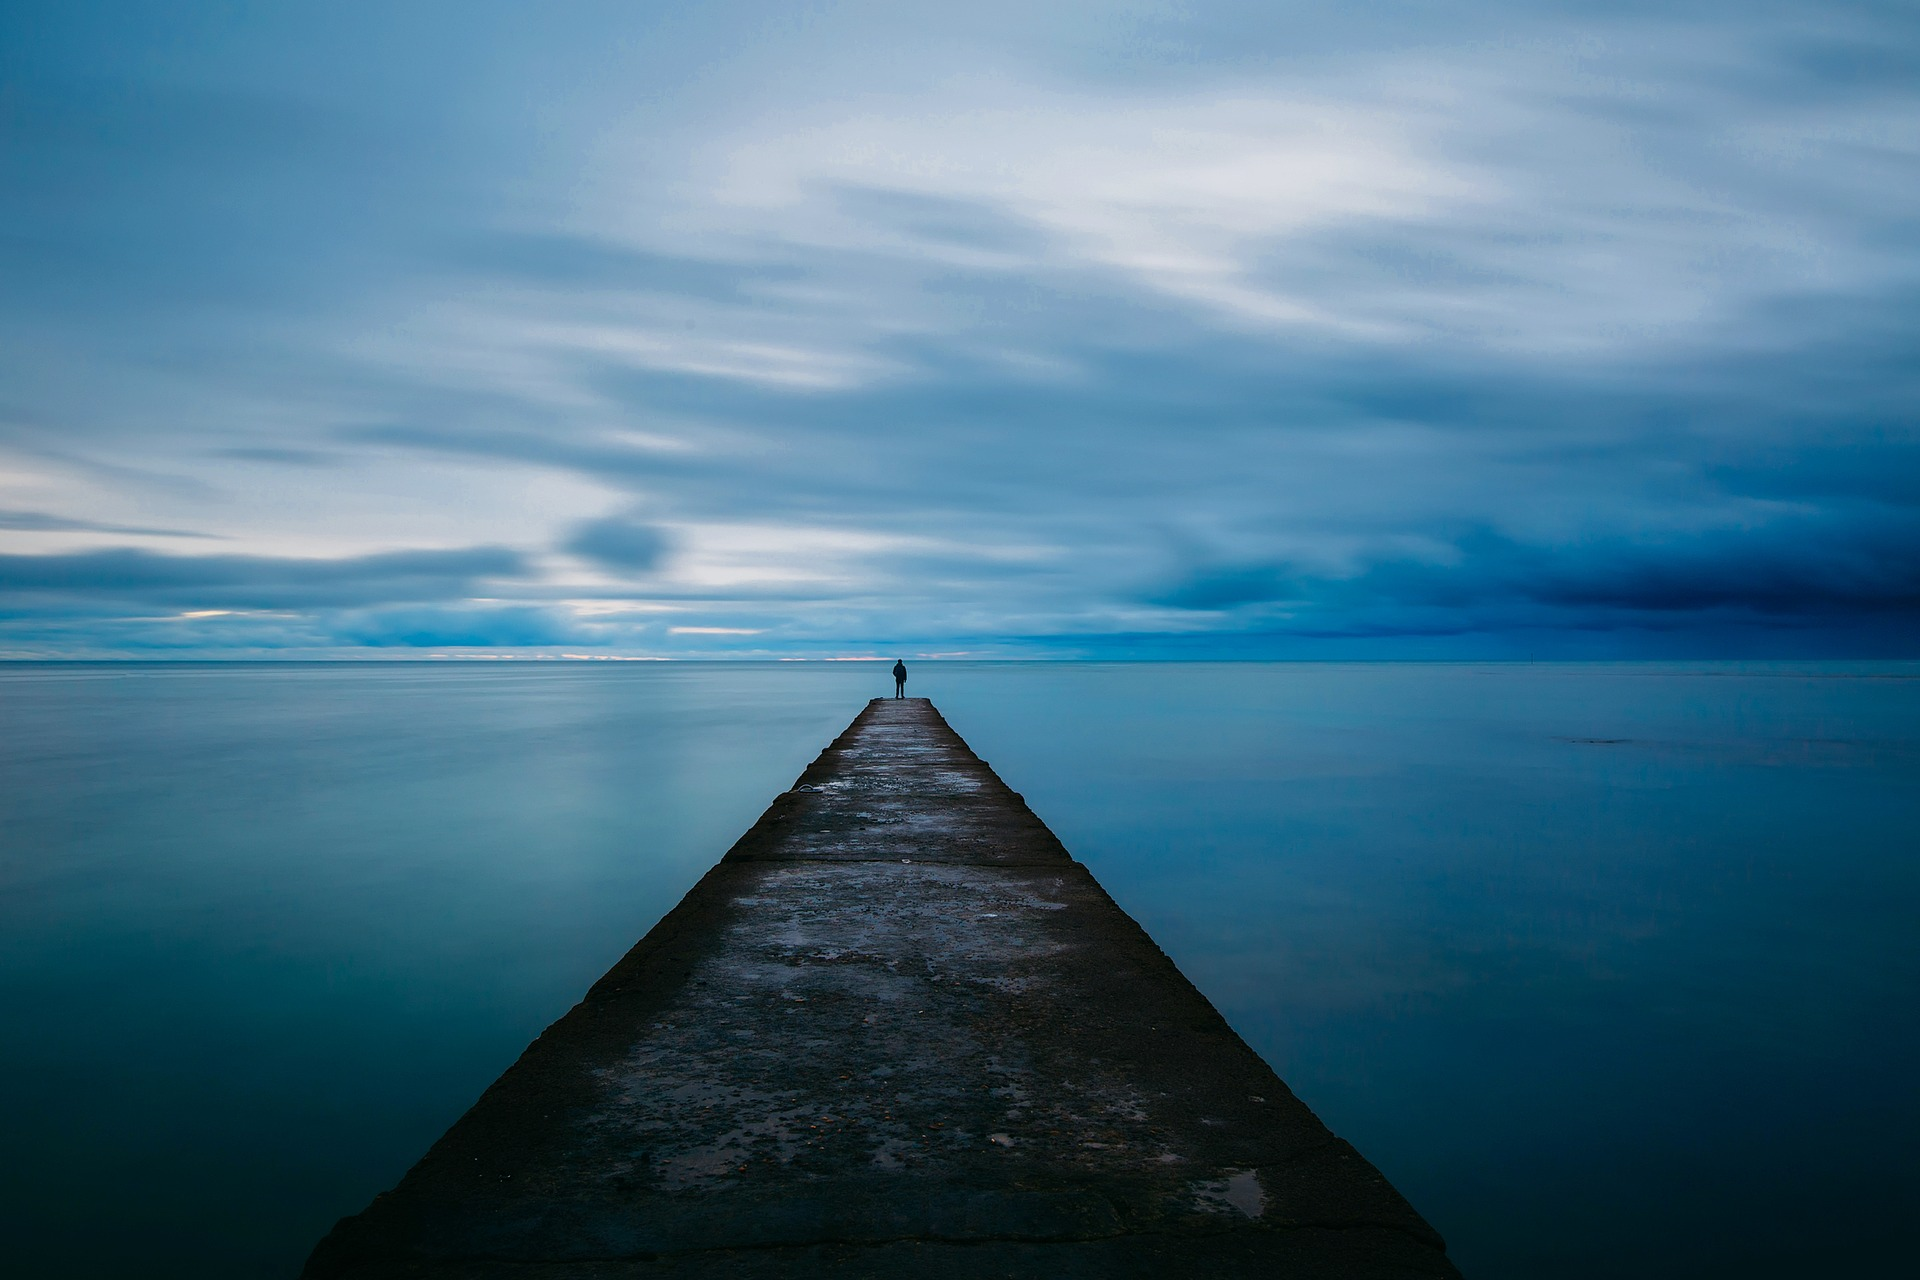 dock-1979547_1920.jpg